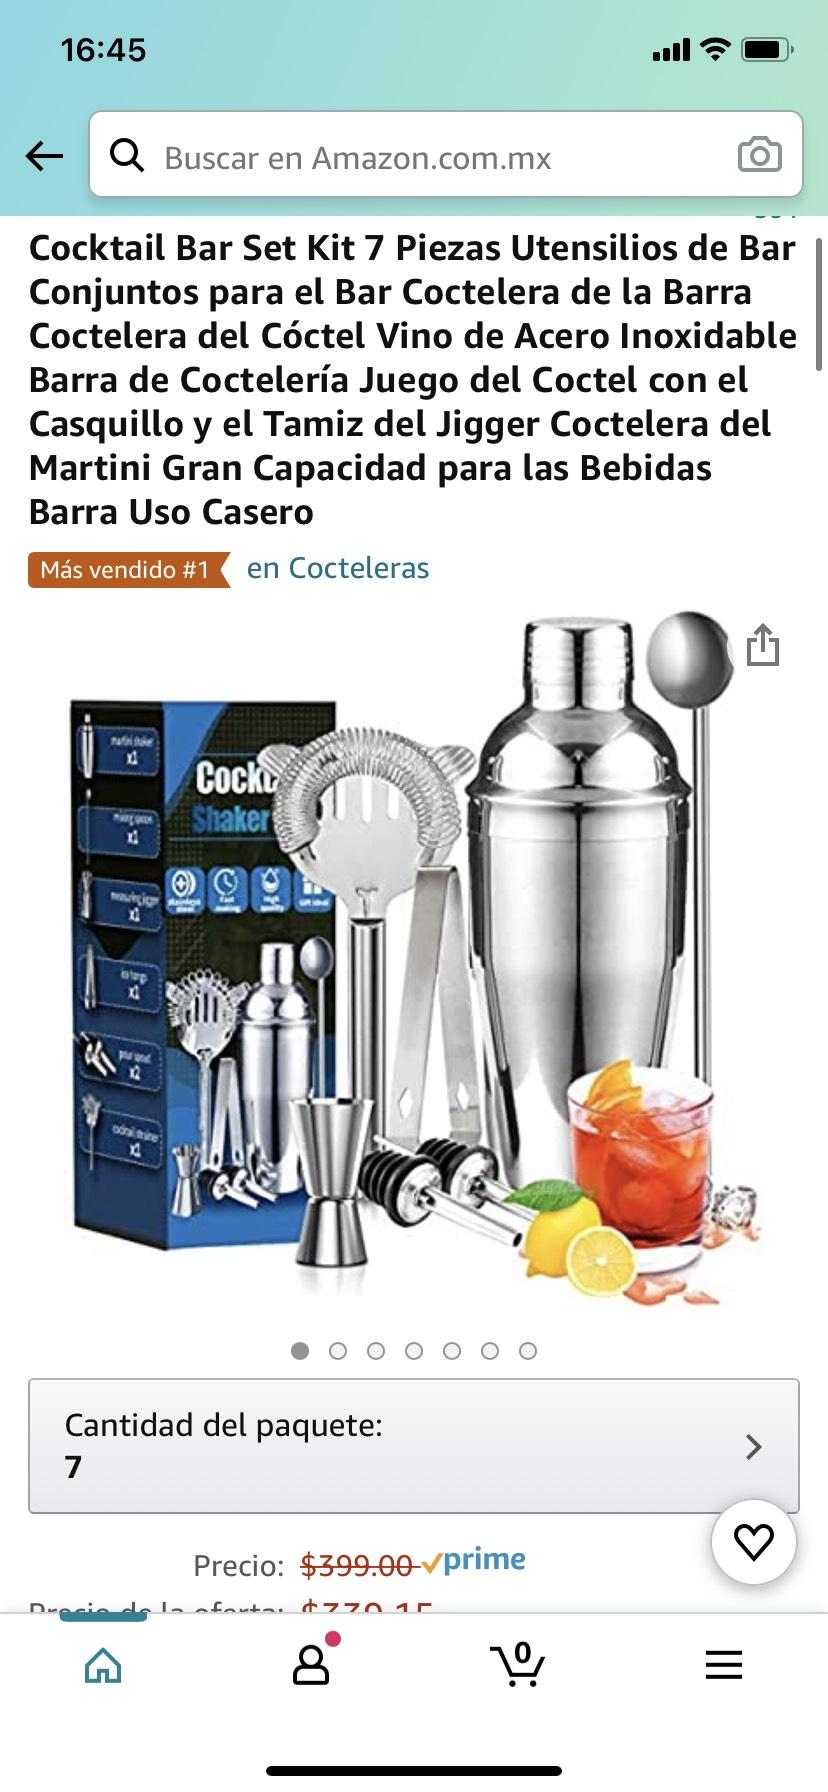 Amazon: Cocktail Bar Set Kit 7 Piezas Utensilios de Bar